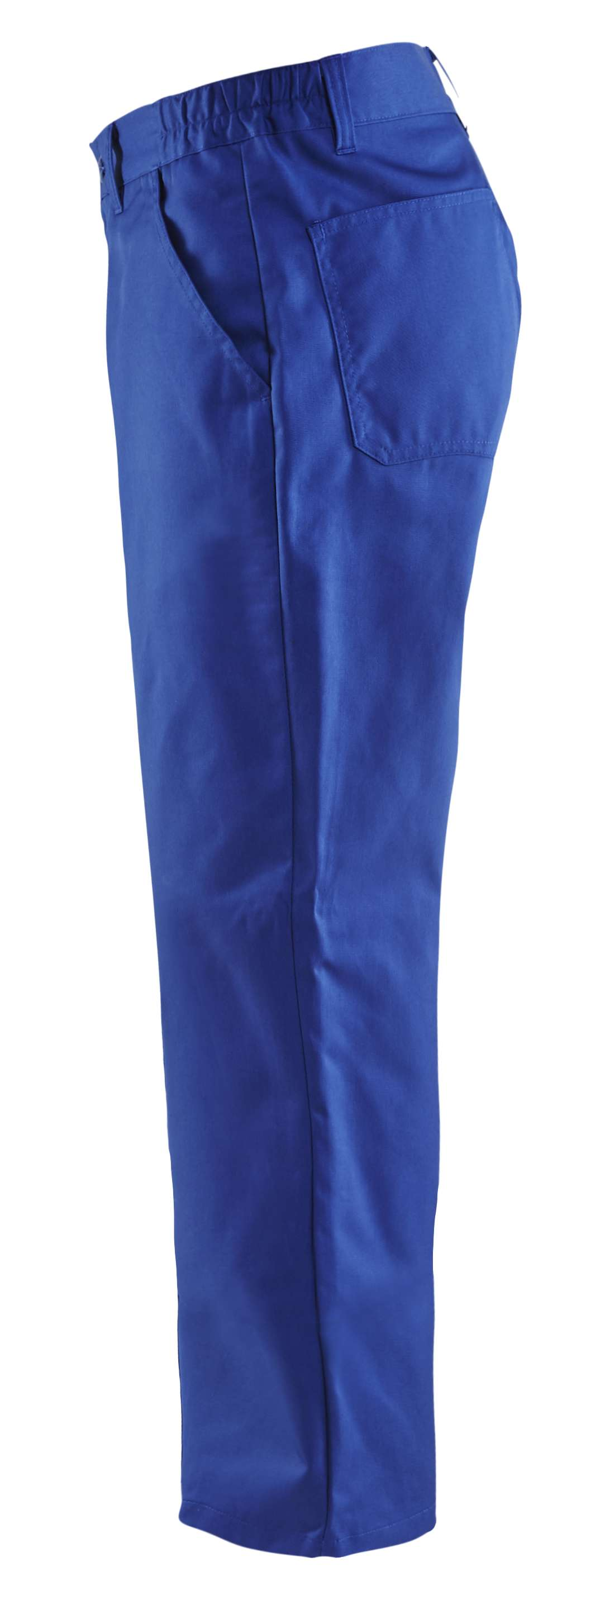 Blaklader Werkbroeken 17251800 korenblauw(8500)